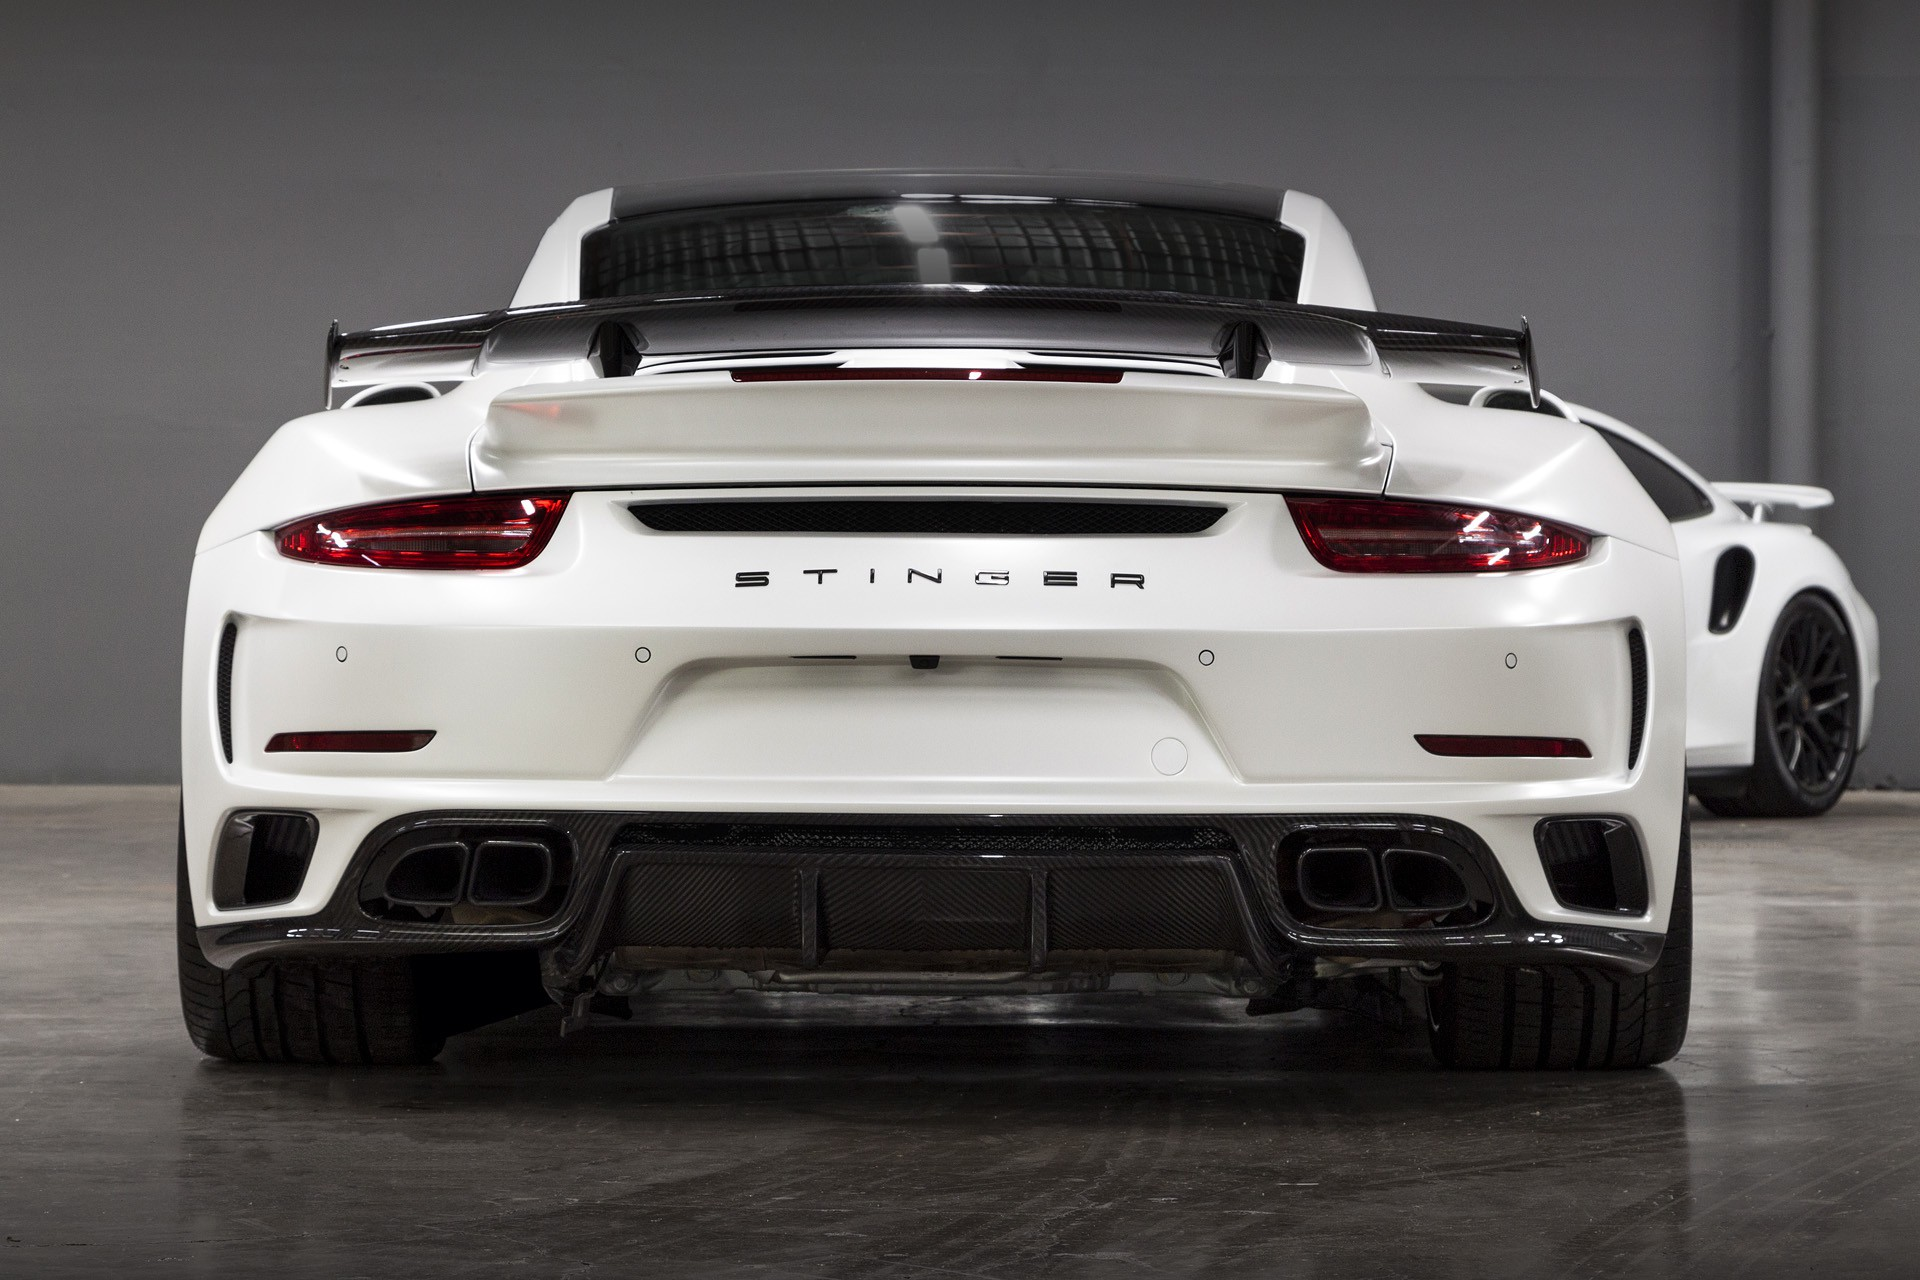 Porsche 991 Turbo S Stinger Gtr Usa Topcar